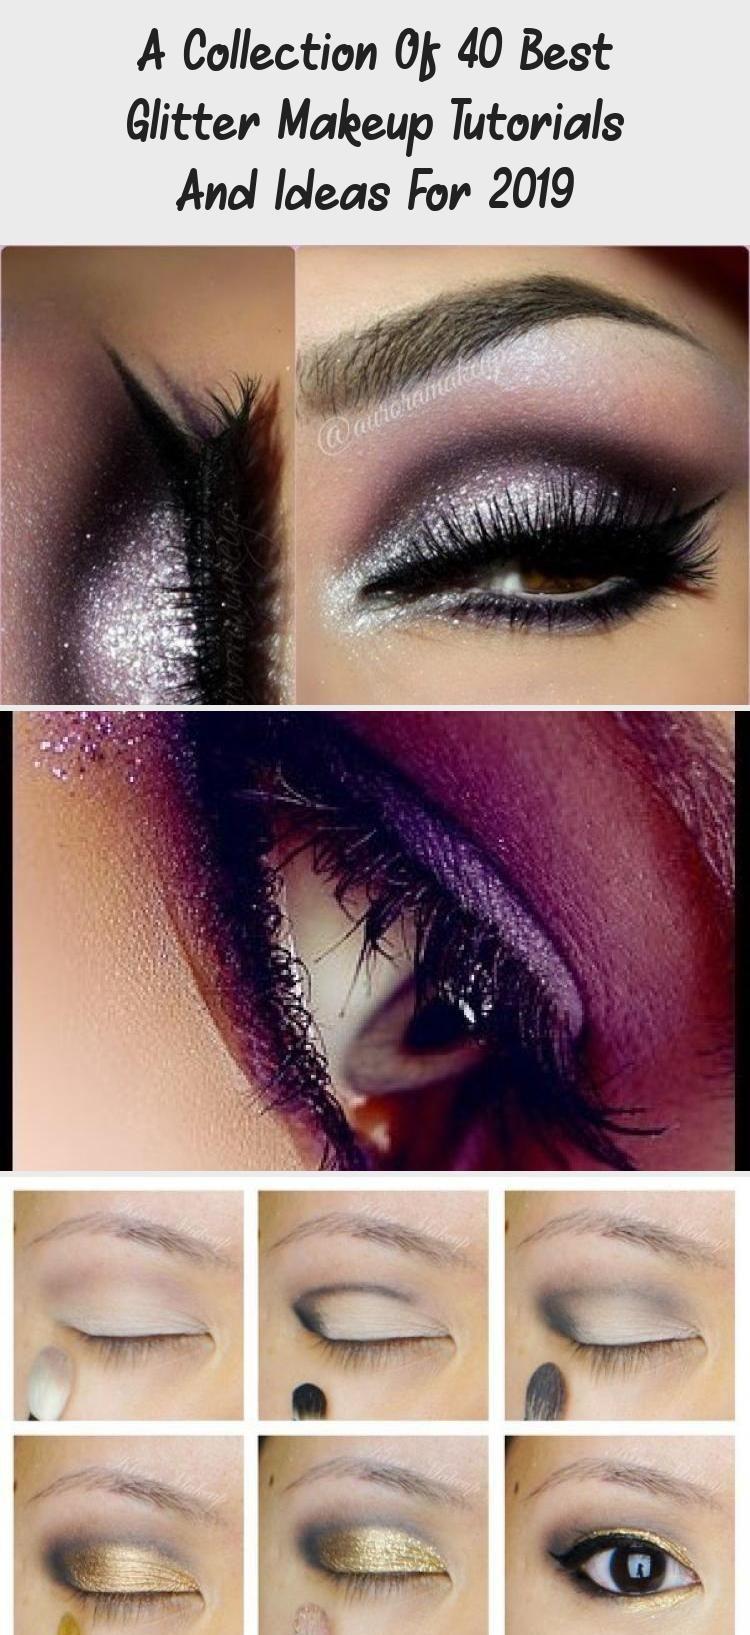 A Collection Of 40 Best Glitter Makeup Tutorials And Ideas For 2019 #glittereyemakeup